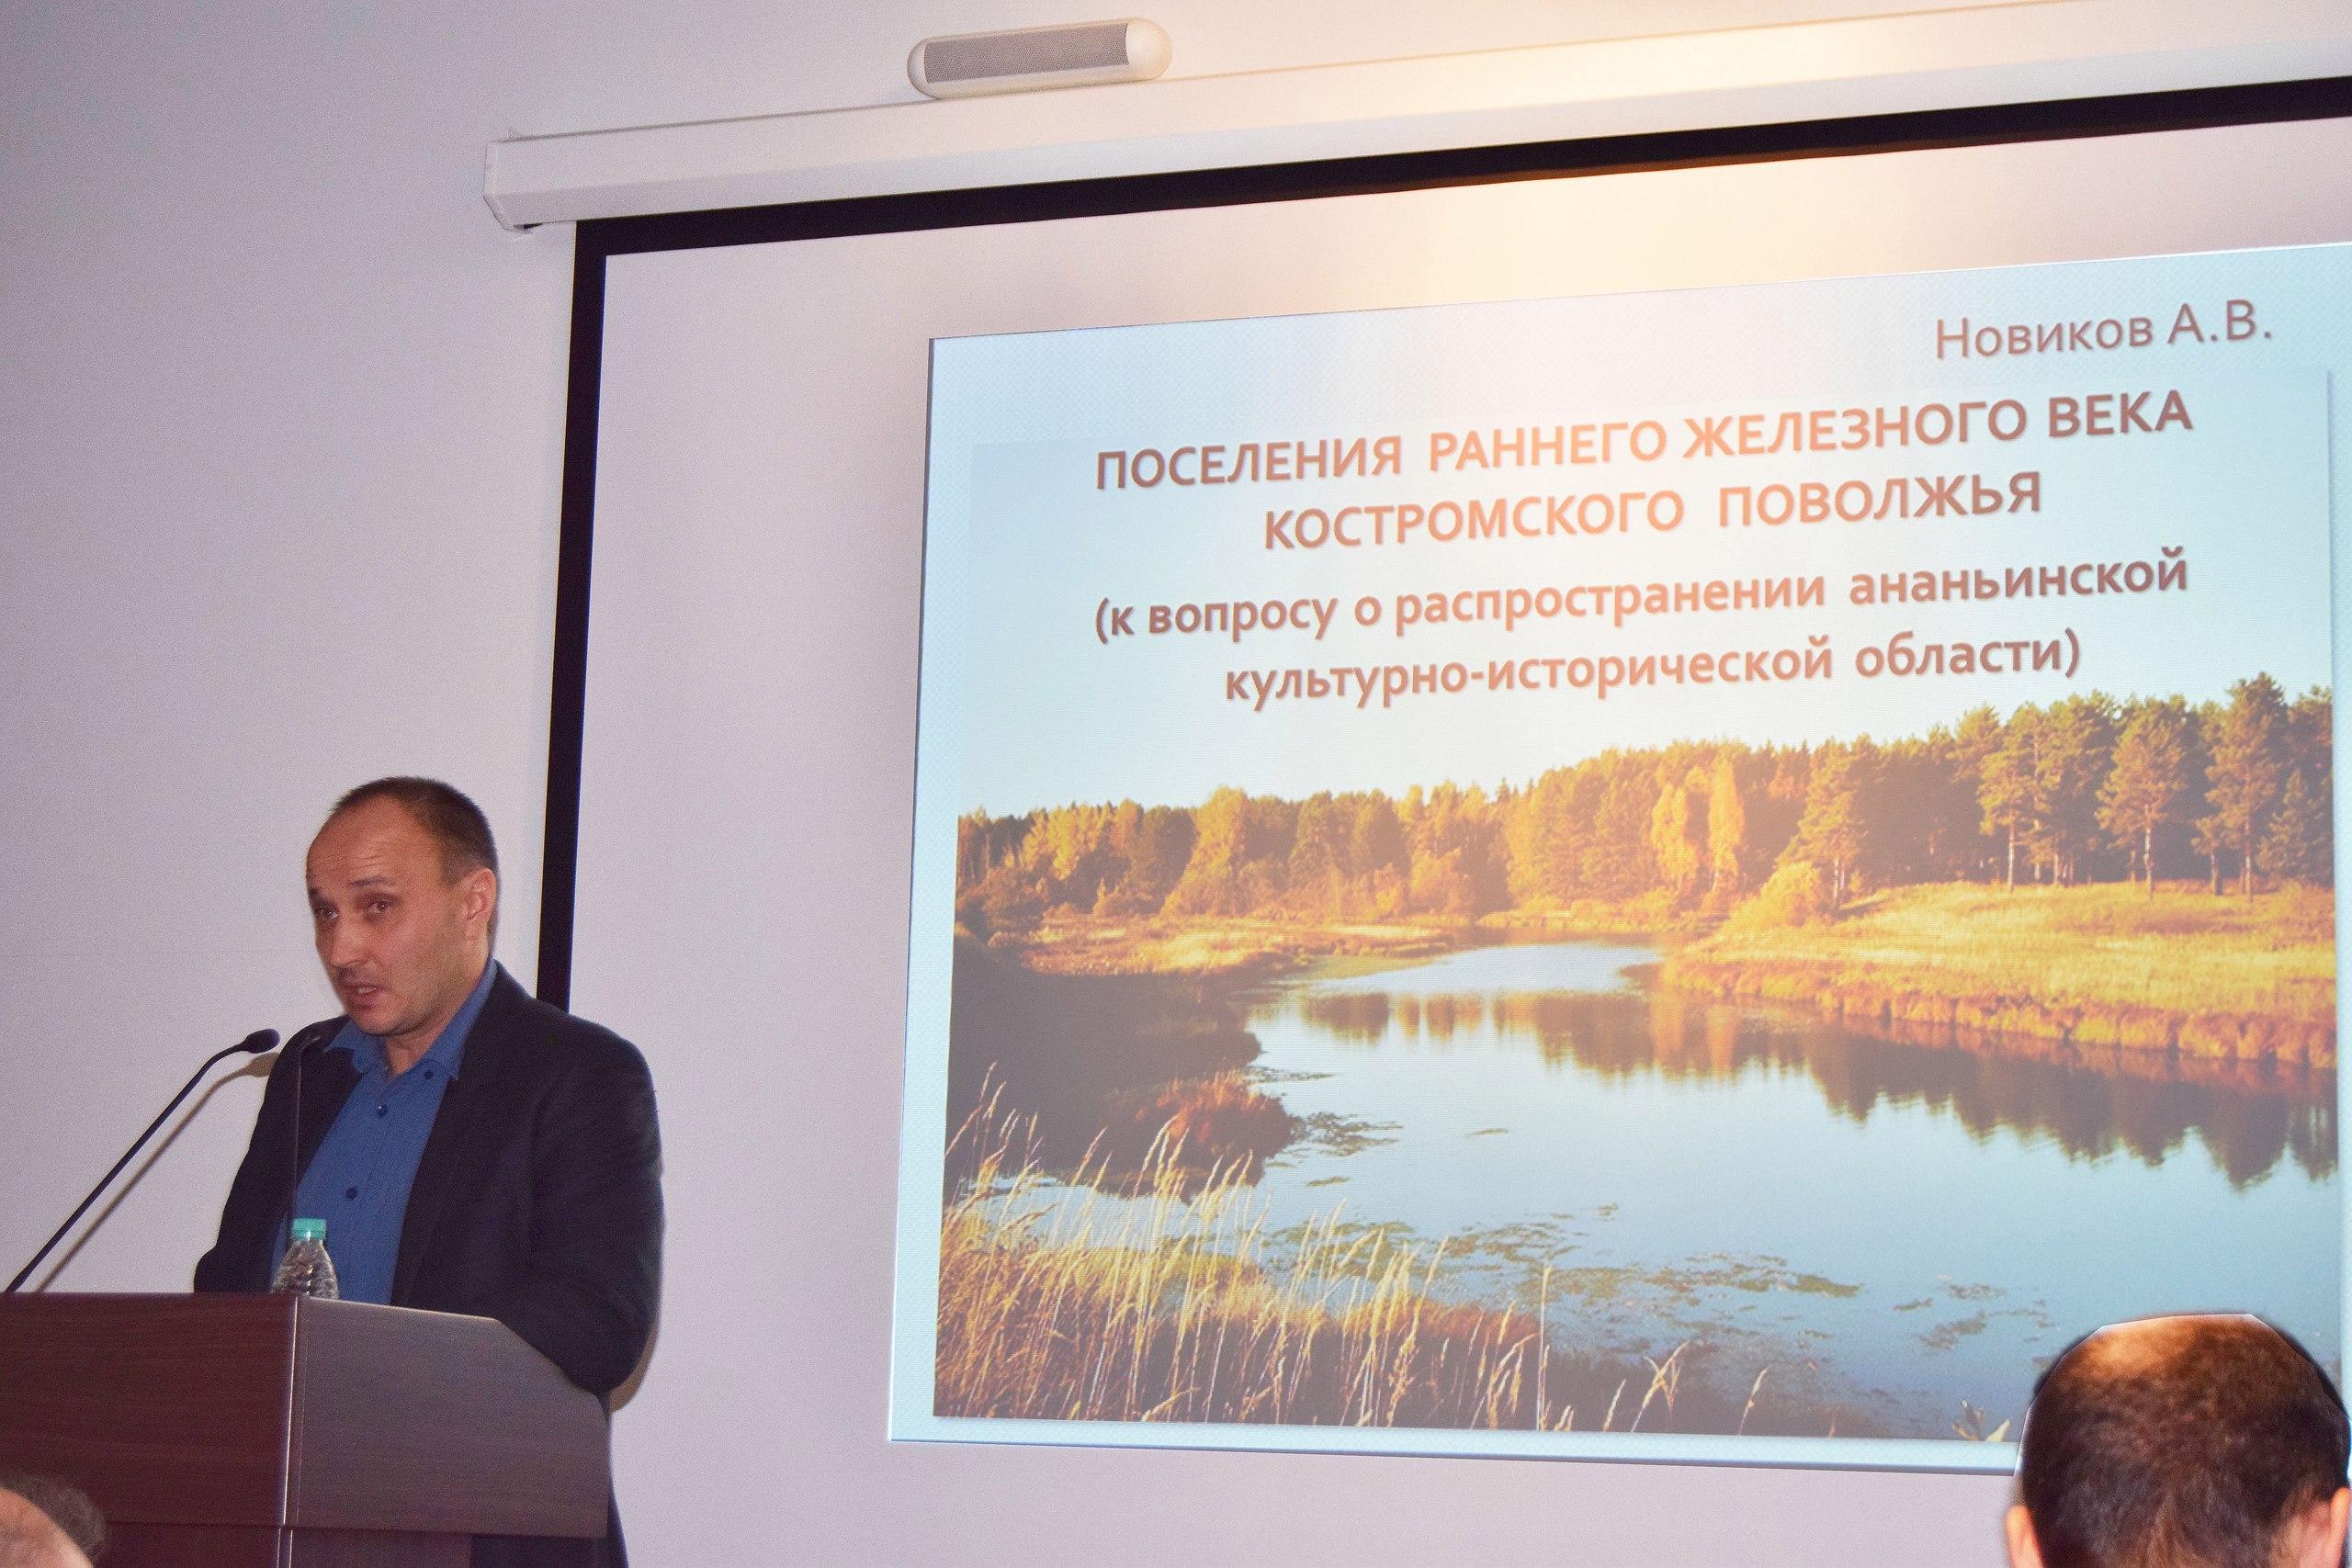 Ананьинский мир-16 Доклад Новикова